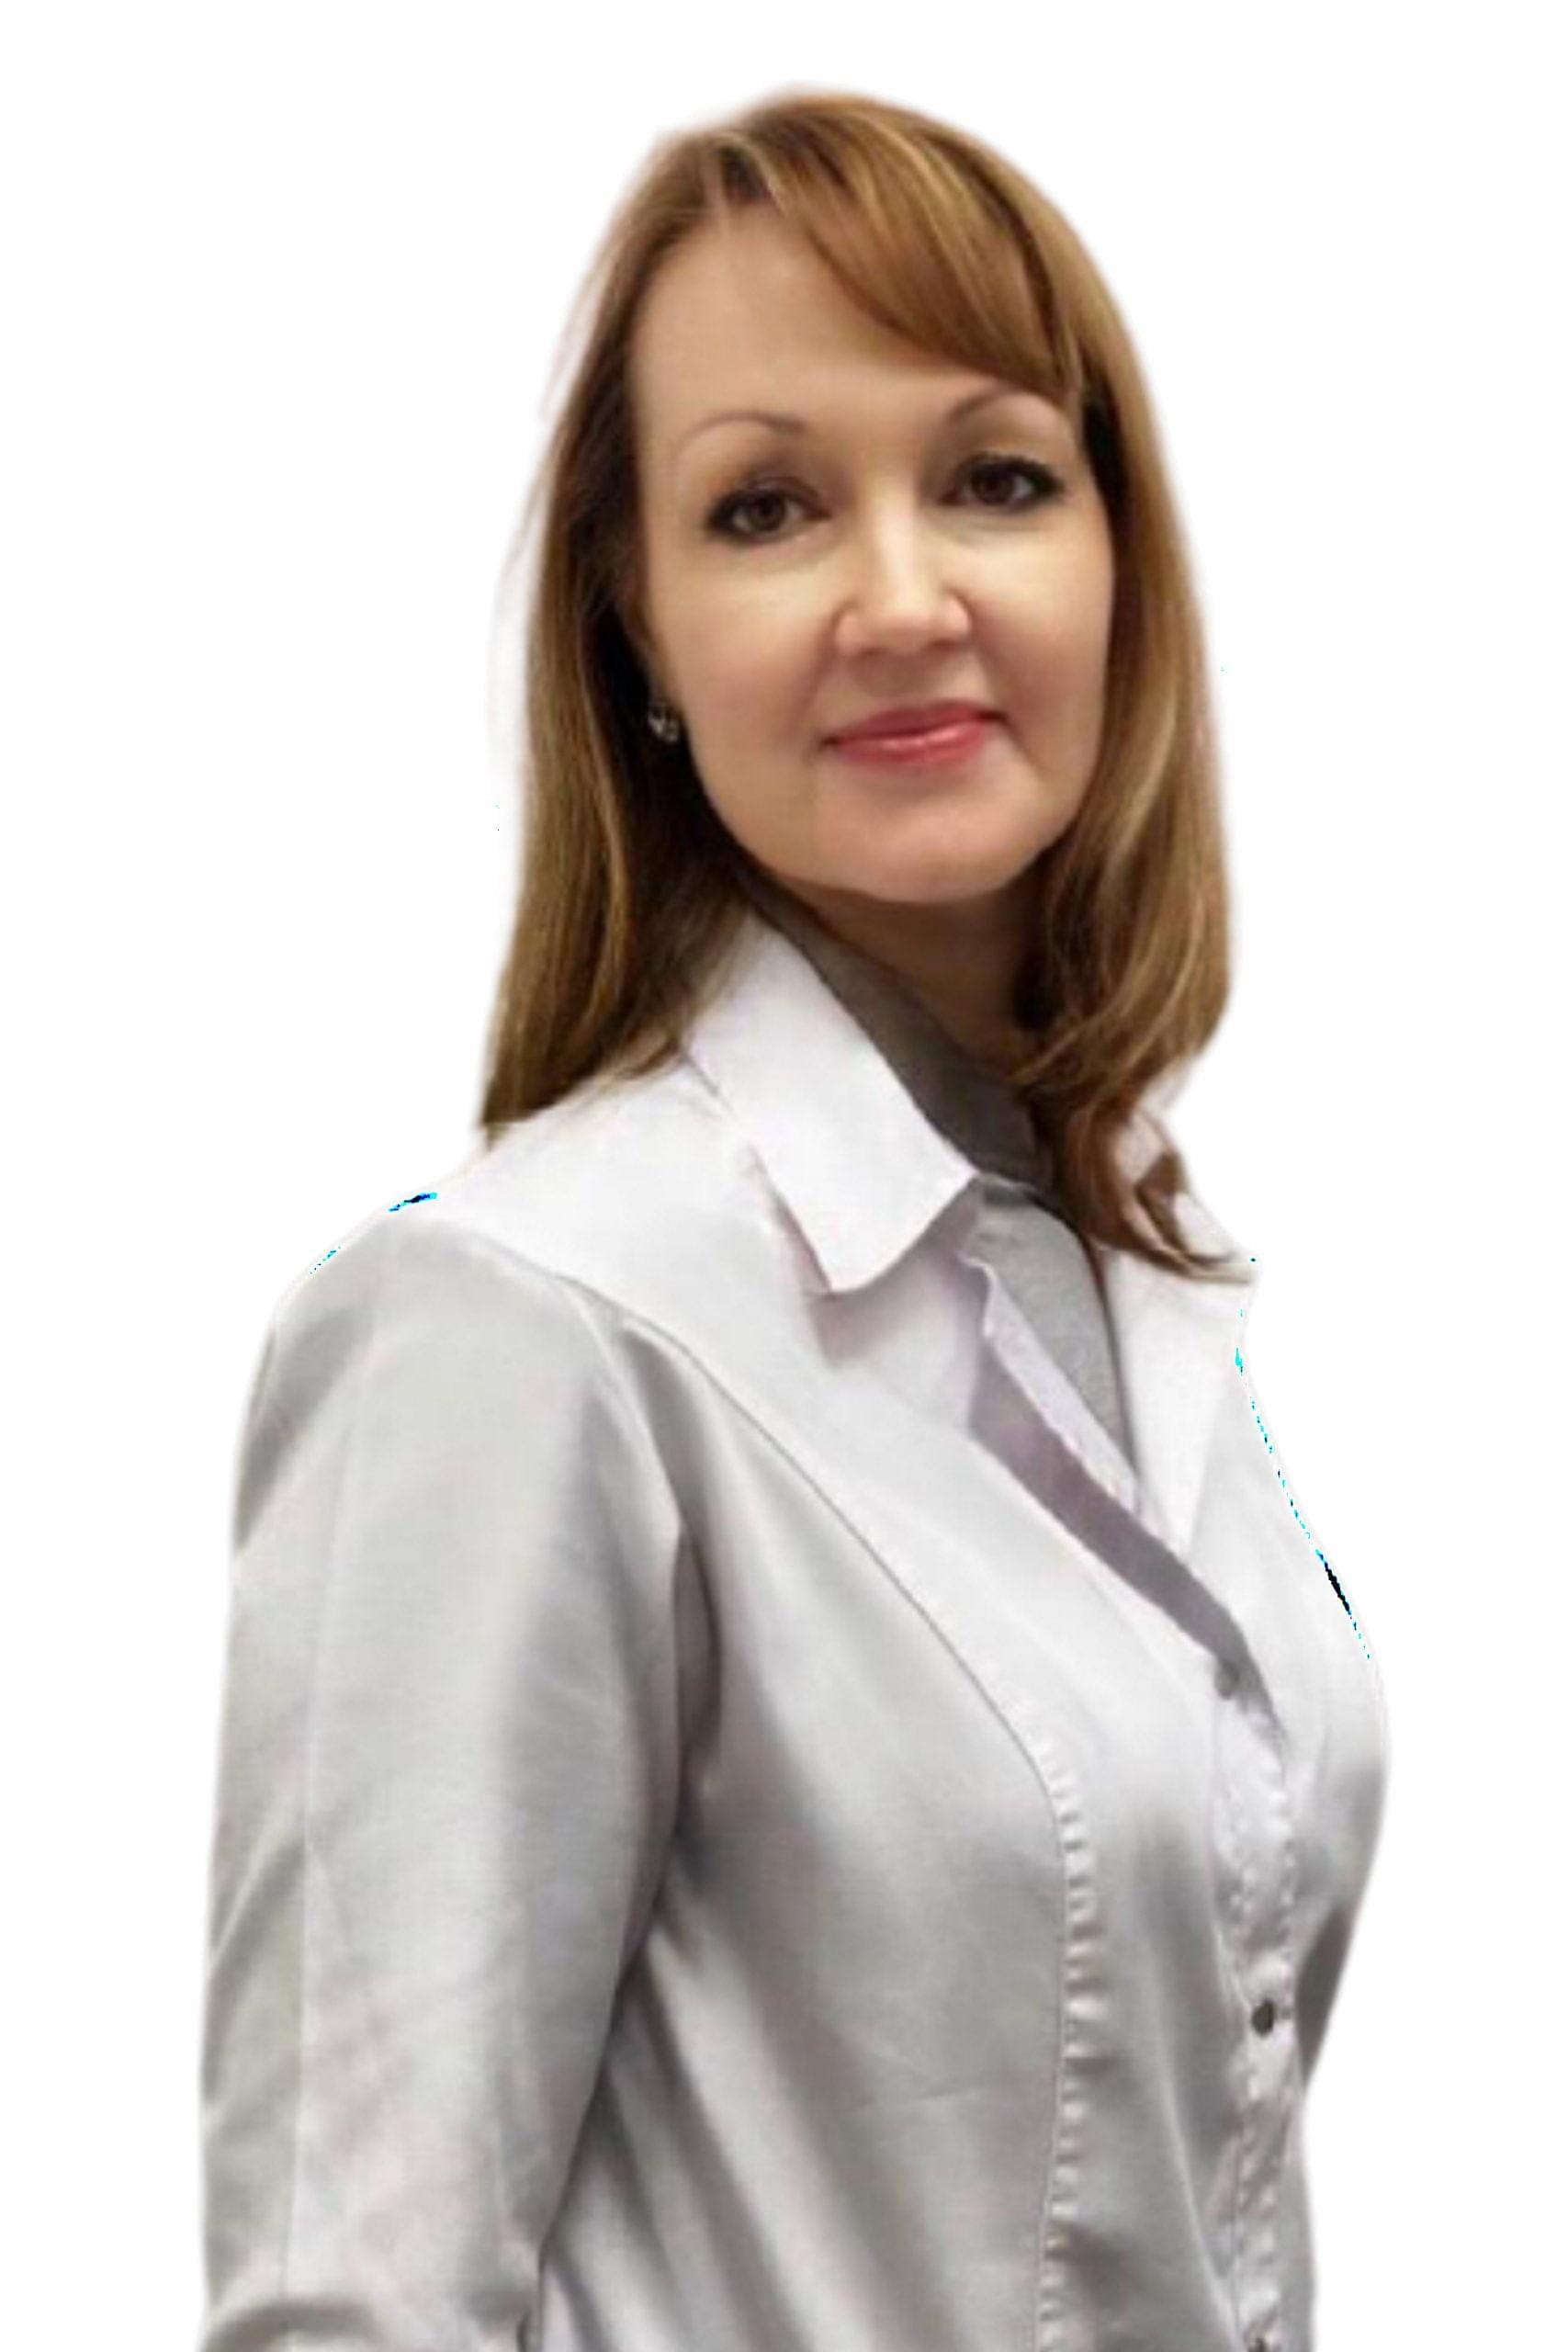 Черновецкая Маргорита Витальевна - Врач офтальмолог